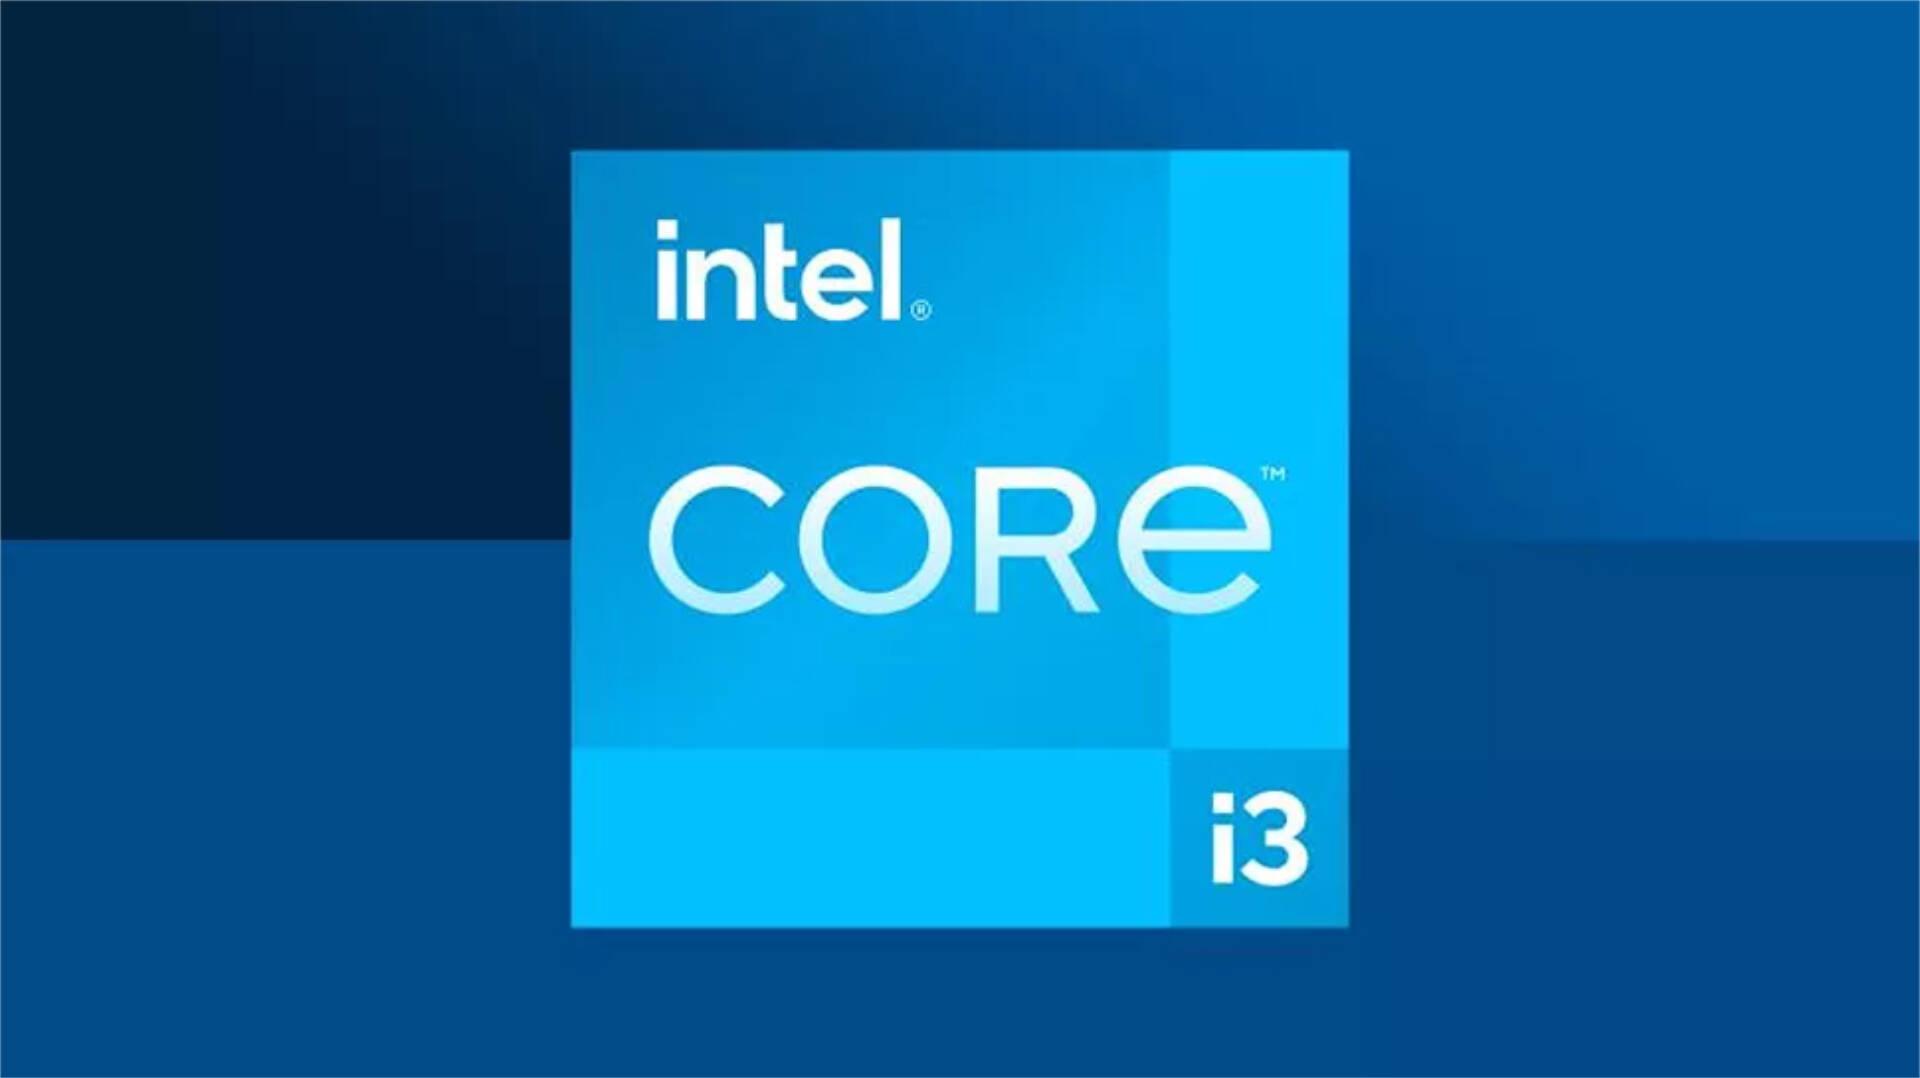 Intel Core i3 Comet Lake Refresh